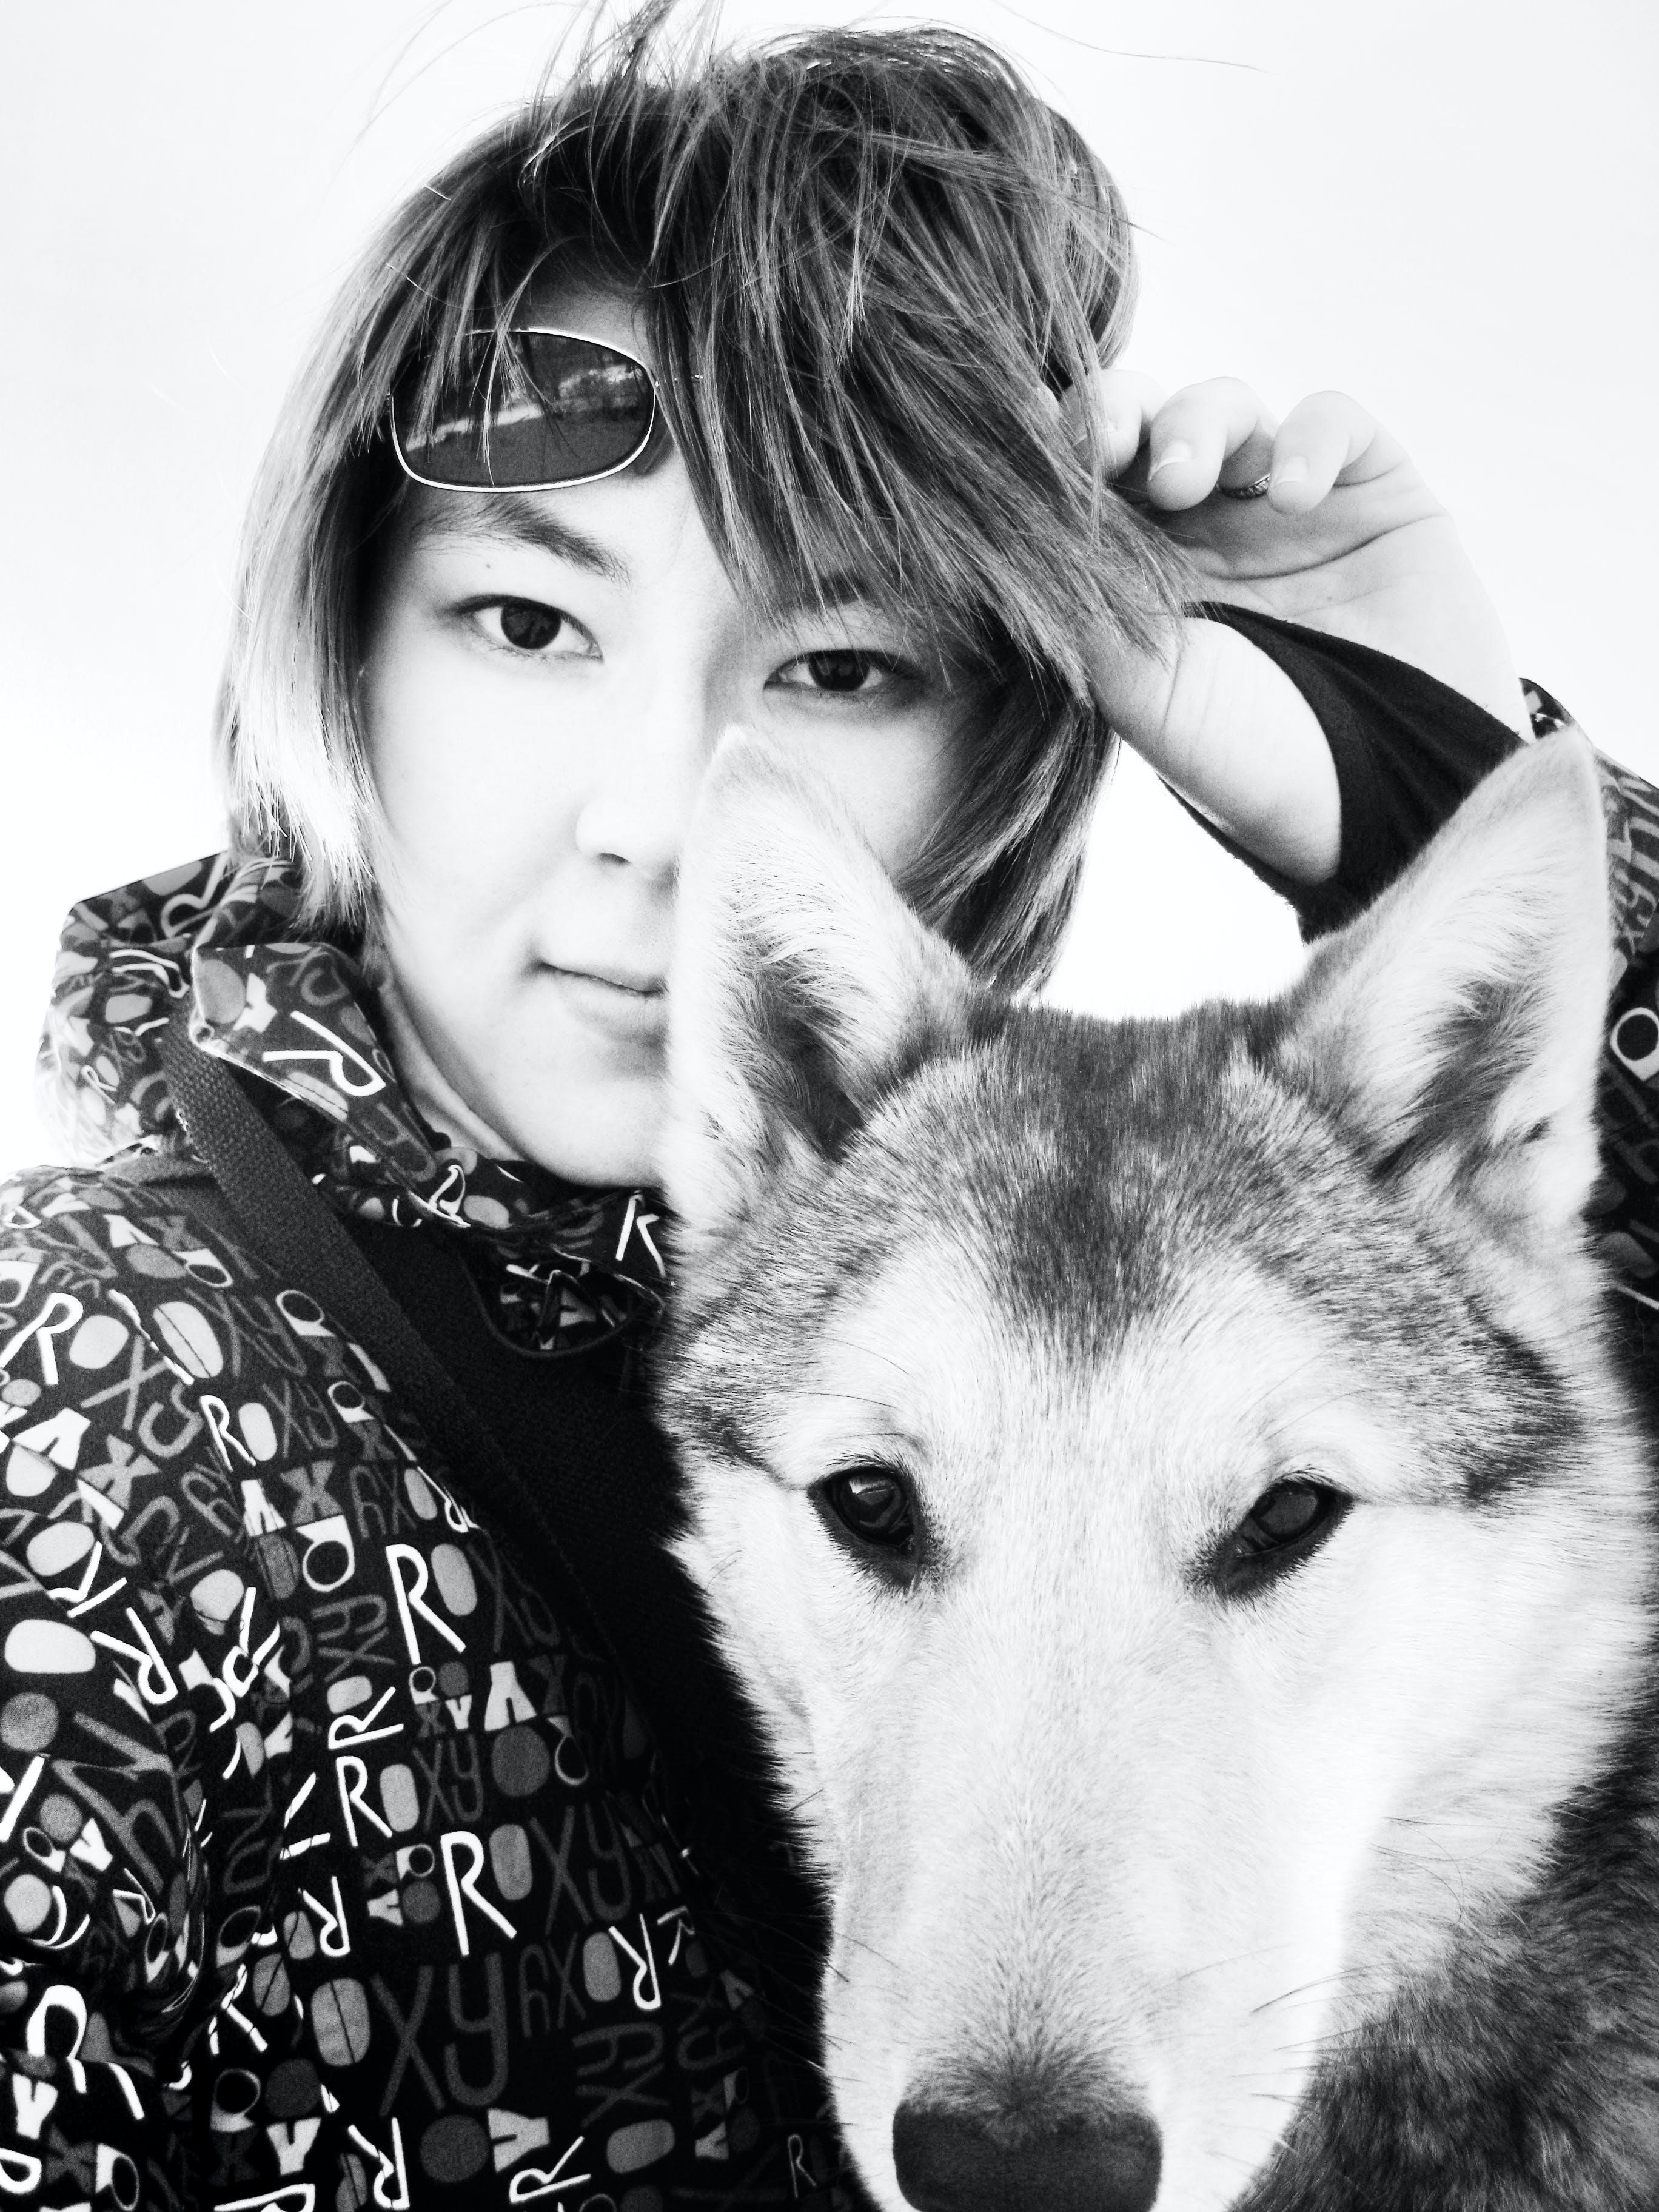 Free stock photo of Asian, black and white, dog, girl